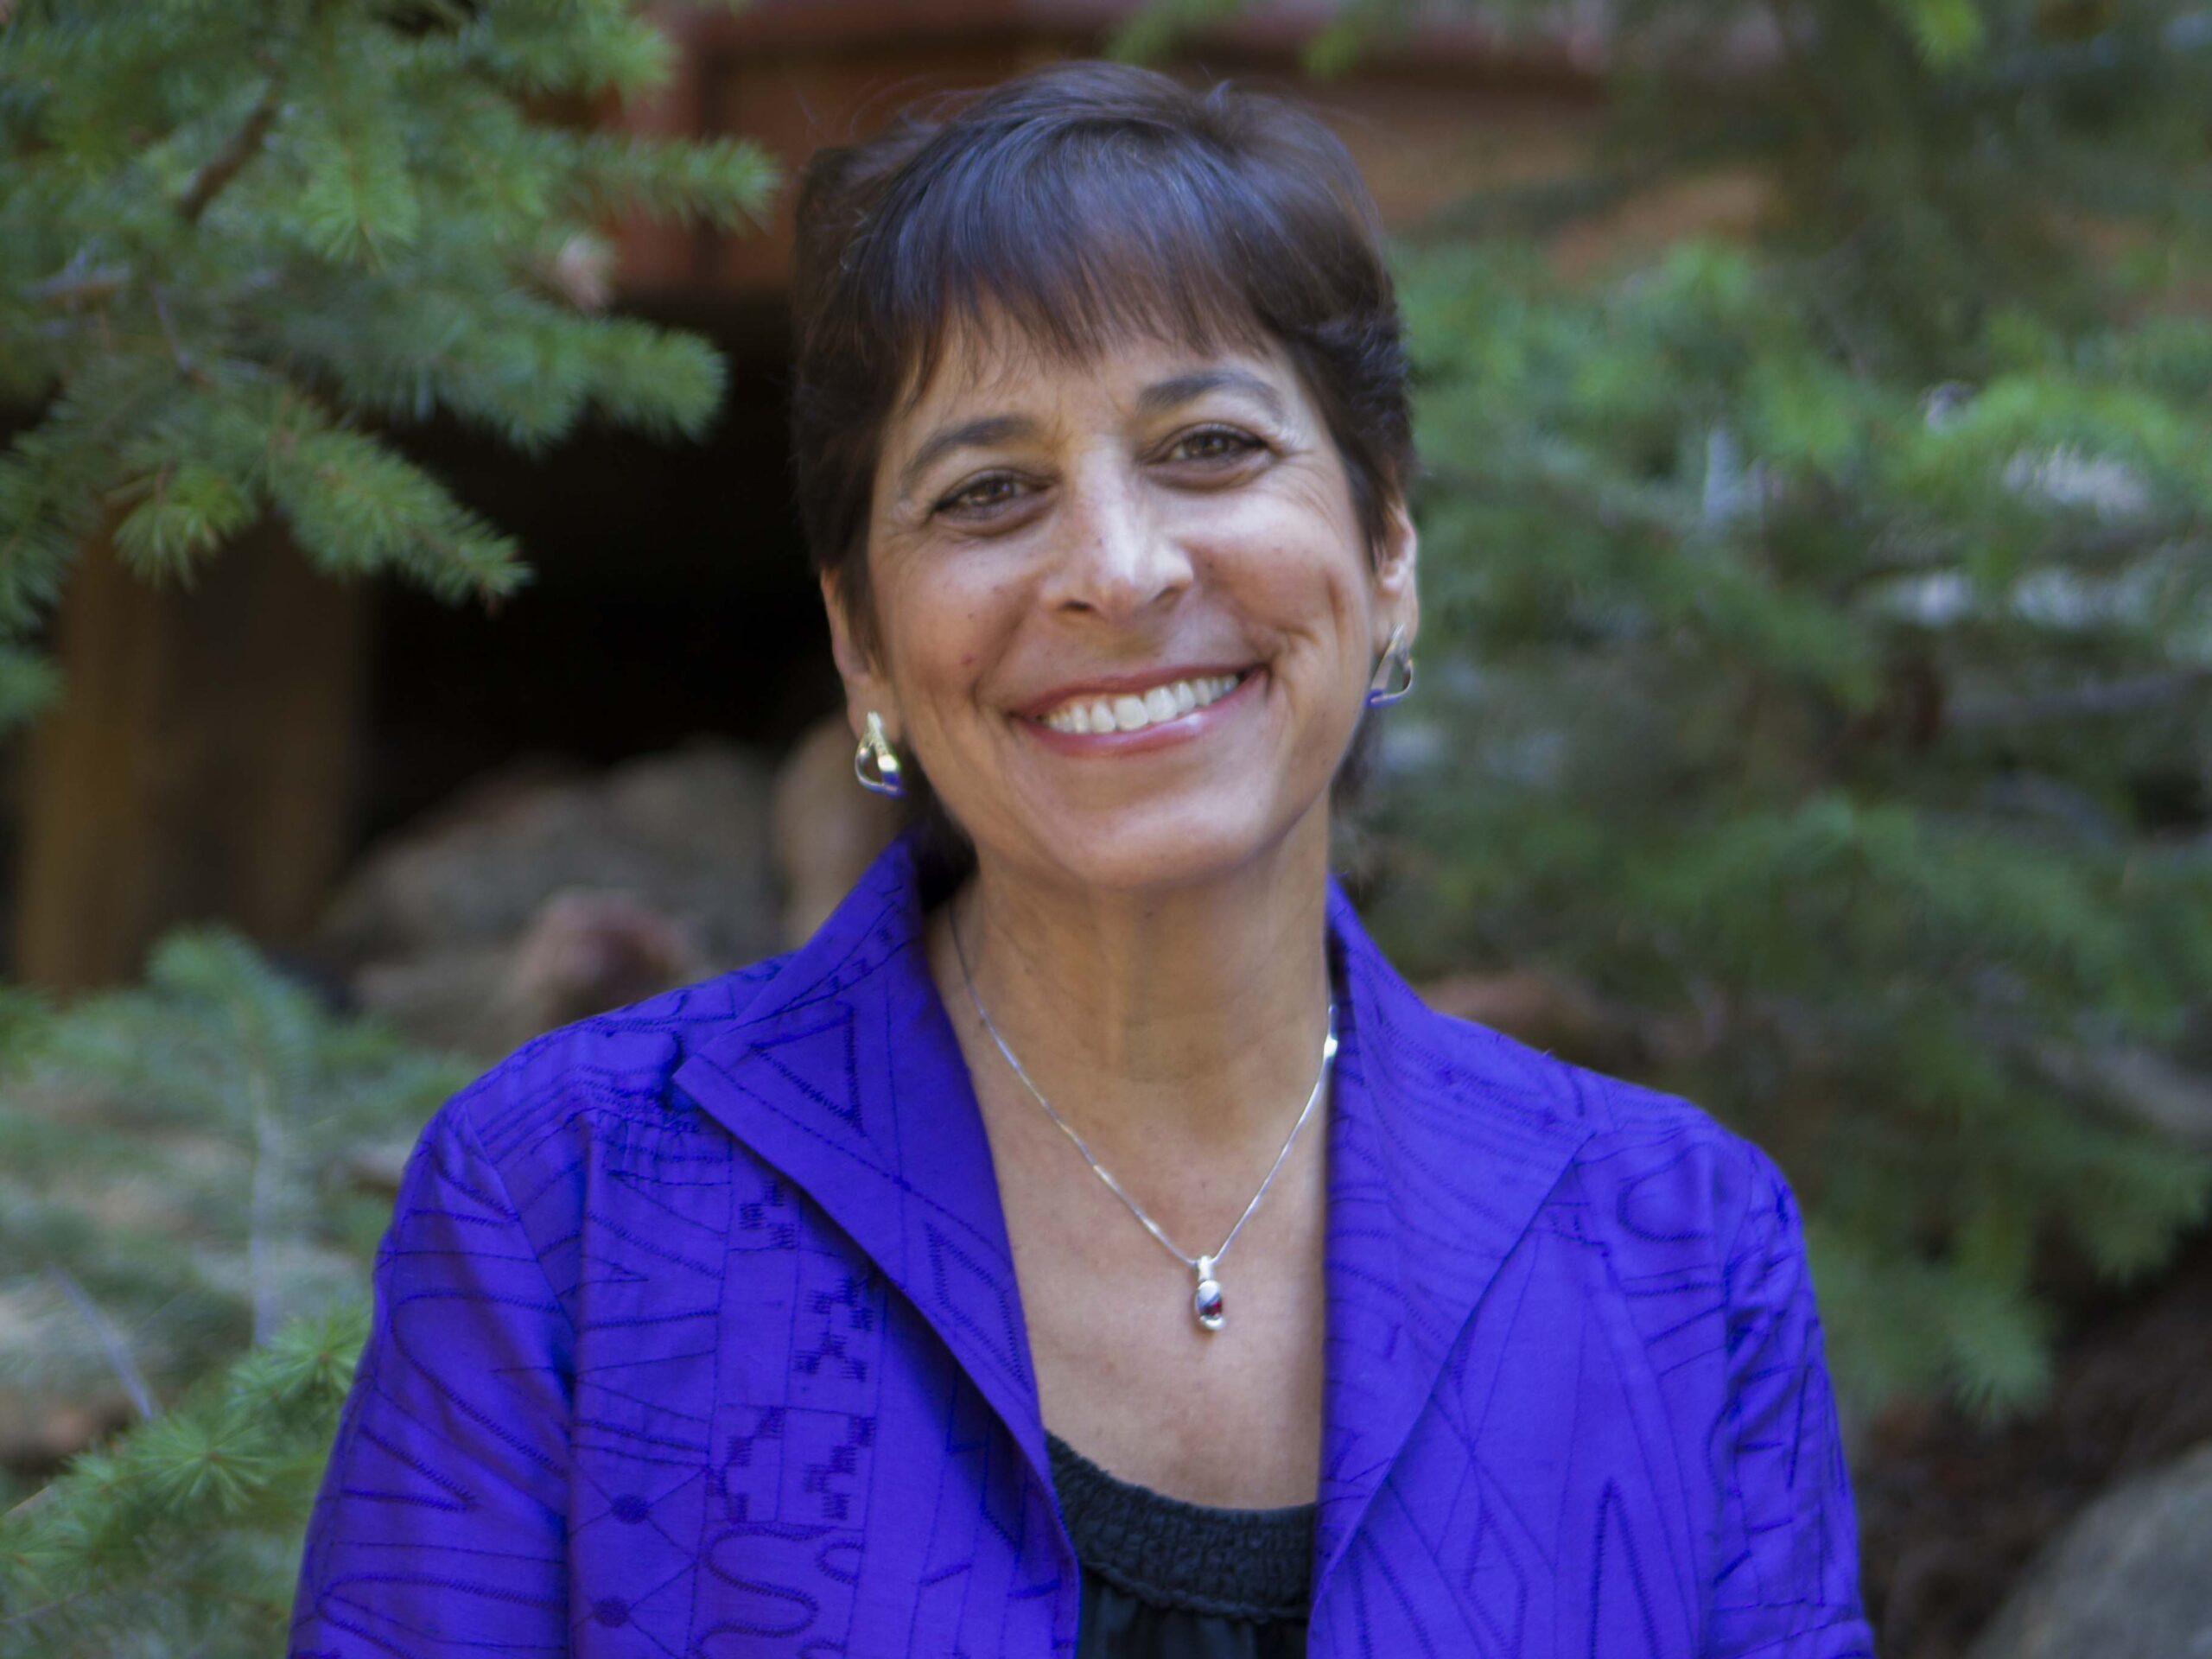 Joanne Baum, PhD, LCSW, CAS